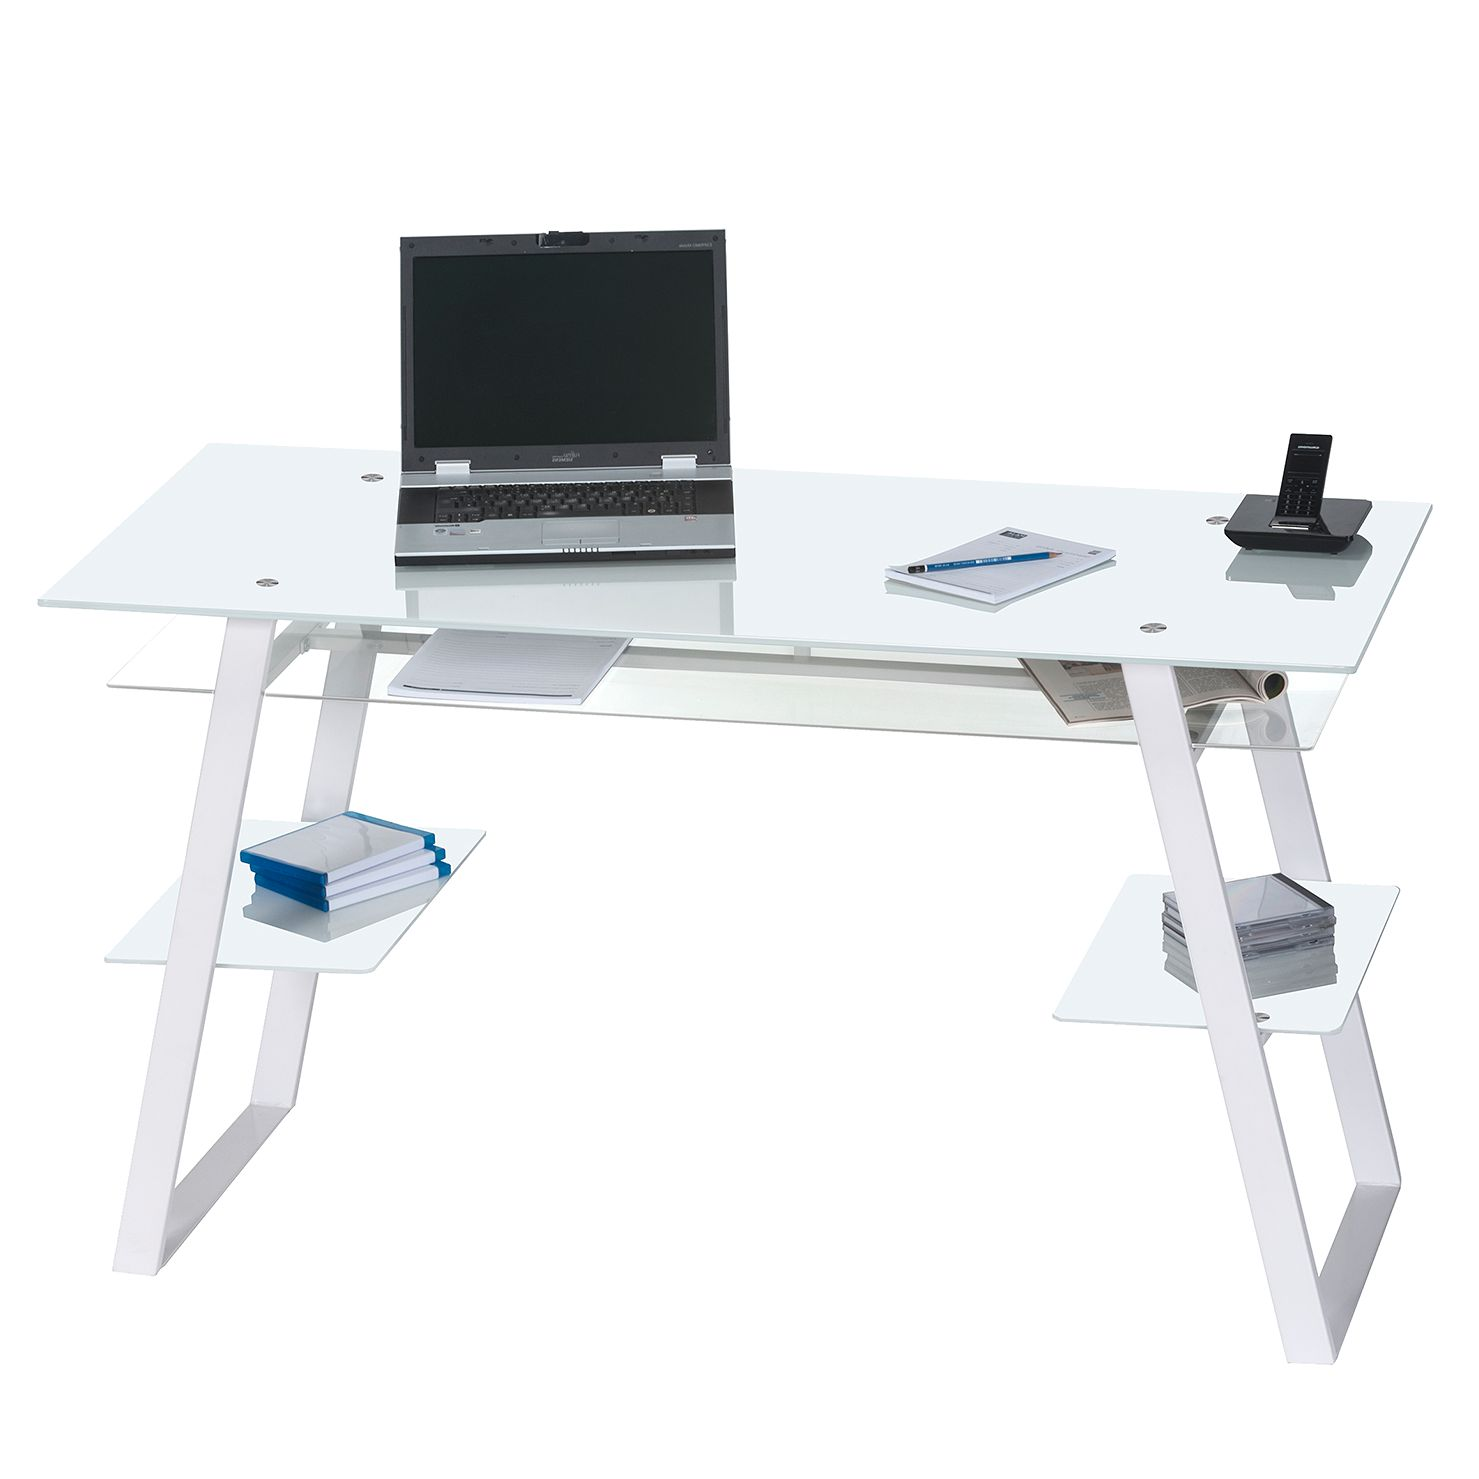 Bureau pour ordinateur Nishio - Métal / Verre blanc - Blanc, Maja Möbel